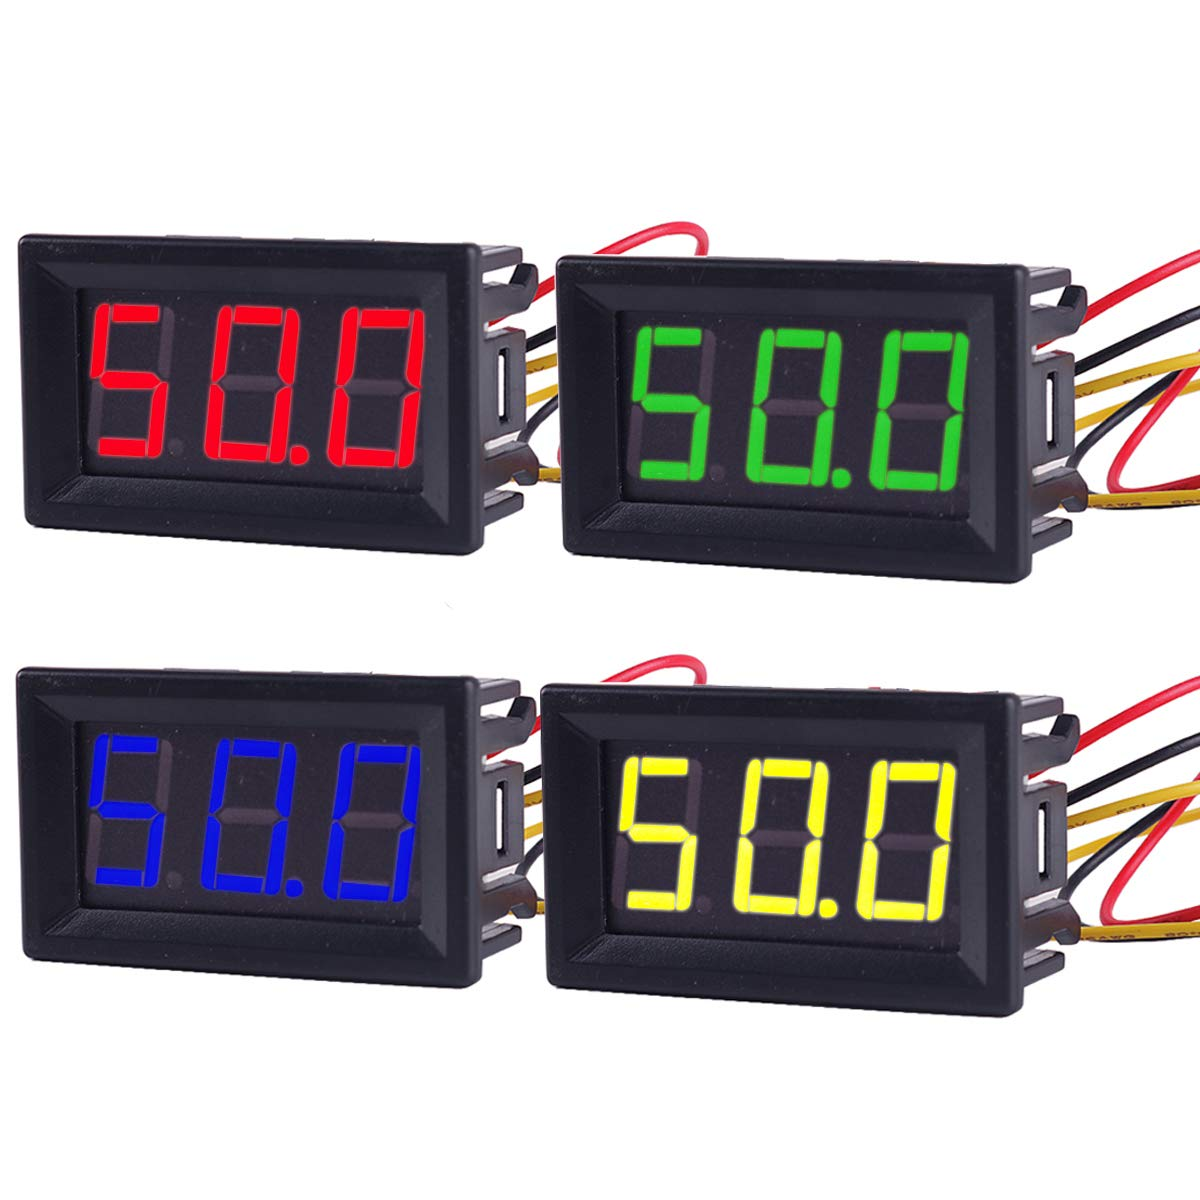 MakerFocus 4pcs Digital DC Voltmeter 0.56 Inch Two-Lines 2.5-30V Digital Voltmeter Gauge Tester LED Display Reverse Polarity Protection and Accurate Pressure Measurement 4 Colours